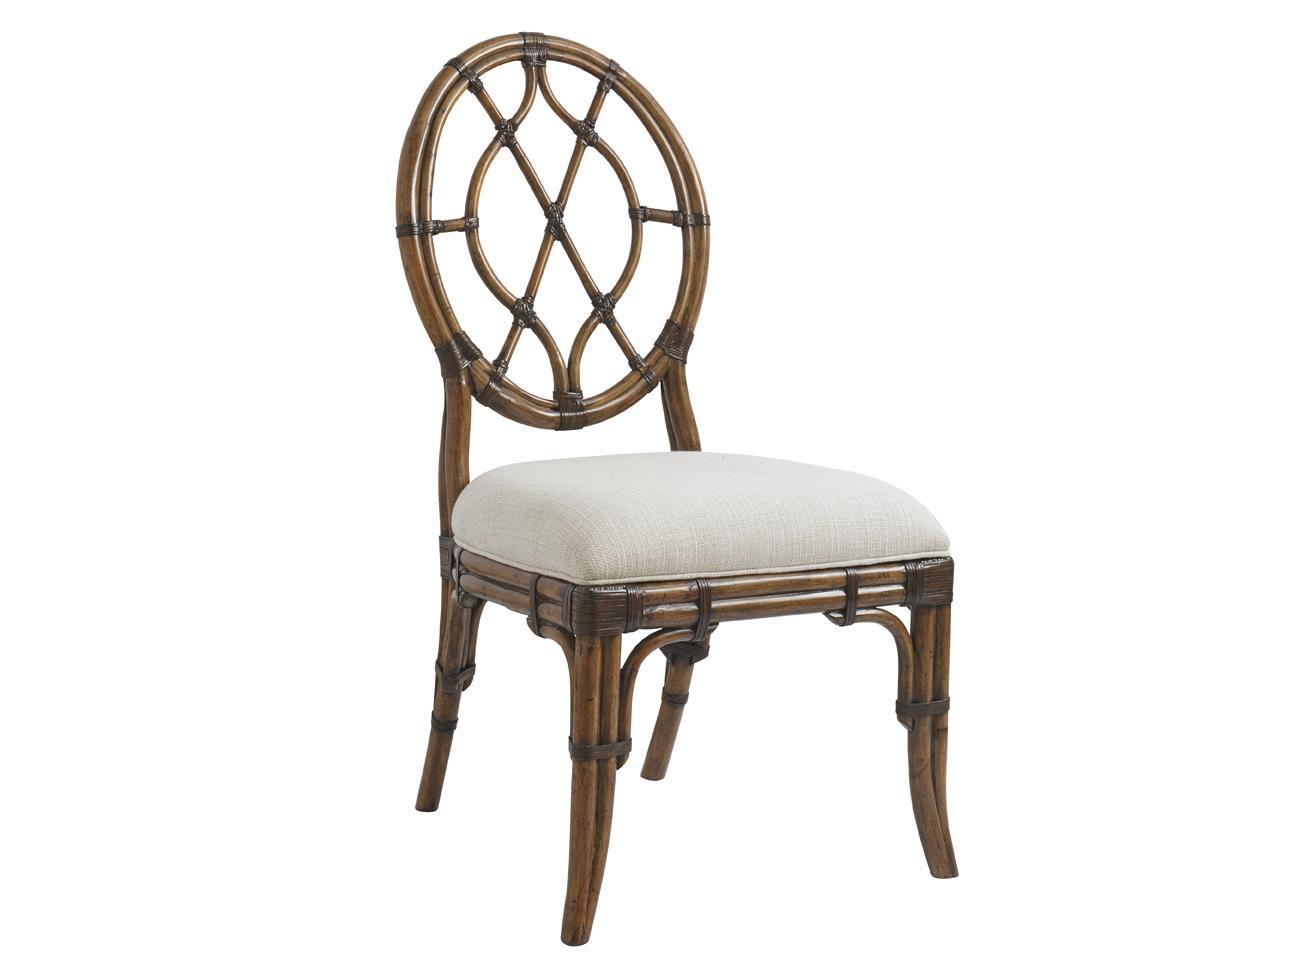 Bali Hai Custom Cedar Key Oval Back Side Chair by Tommy Bahama Home at Baer's Furniture